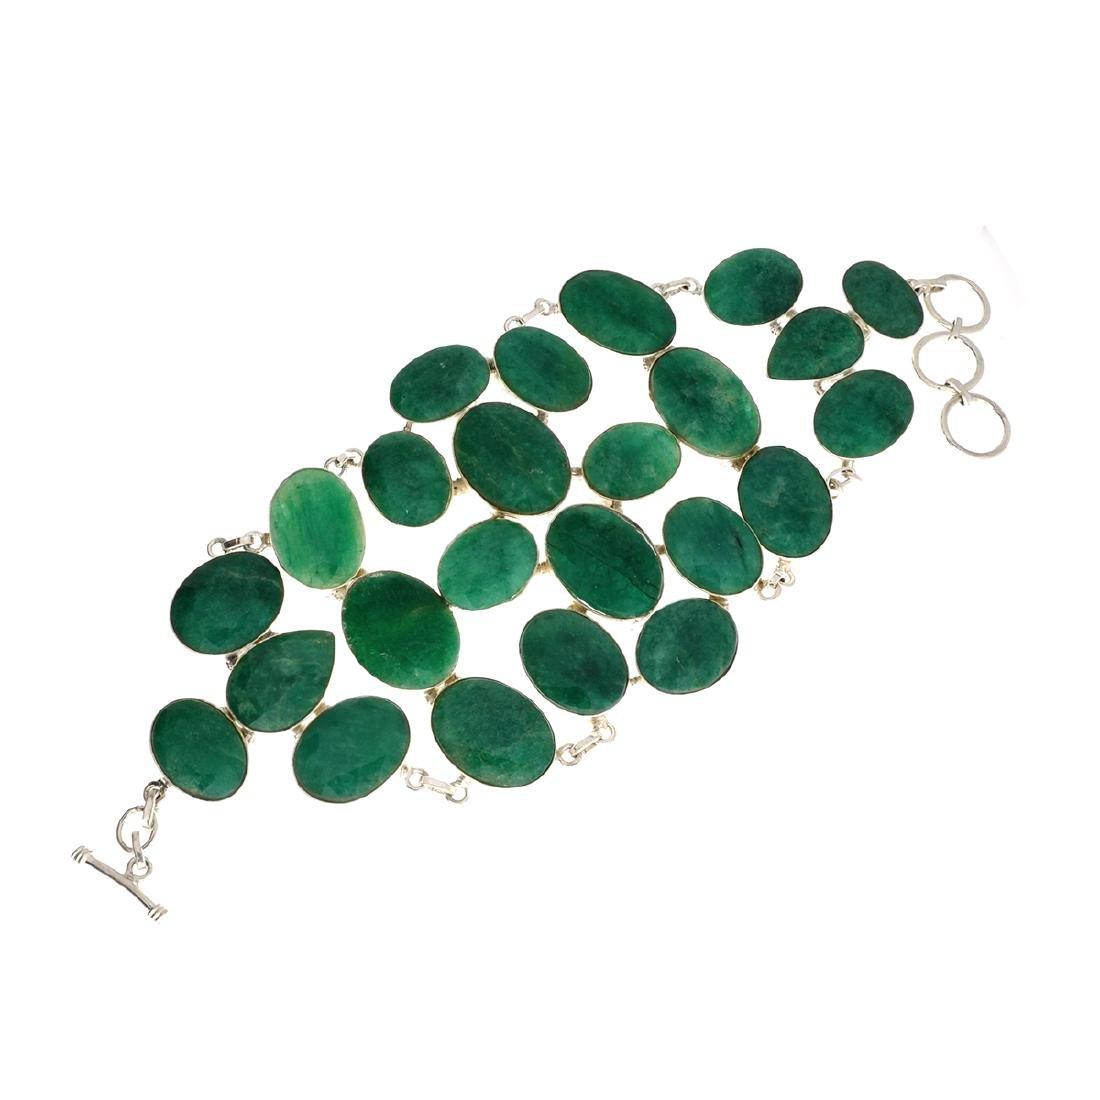 APP: 21.5k 277.87CT Mixed Cut Green Beryl and Sterling